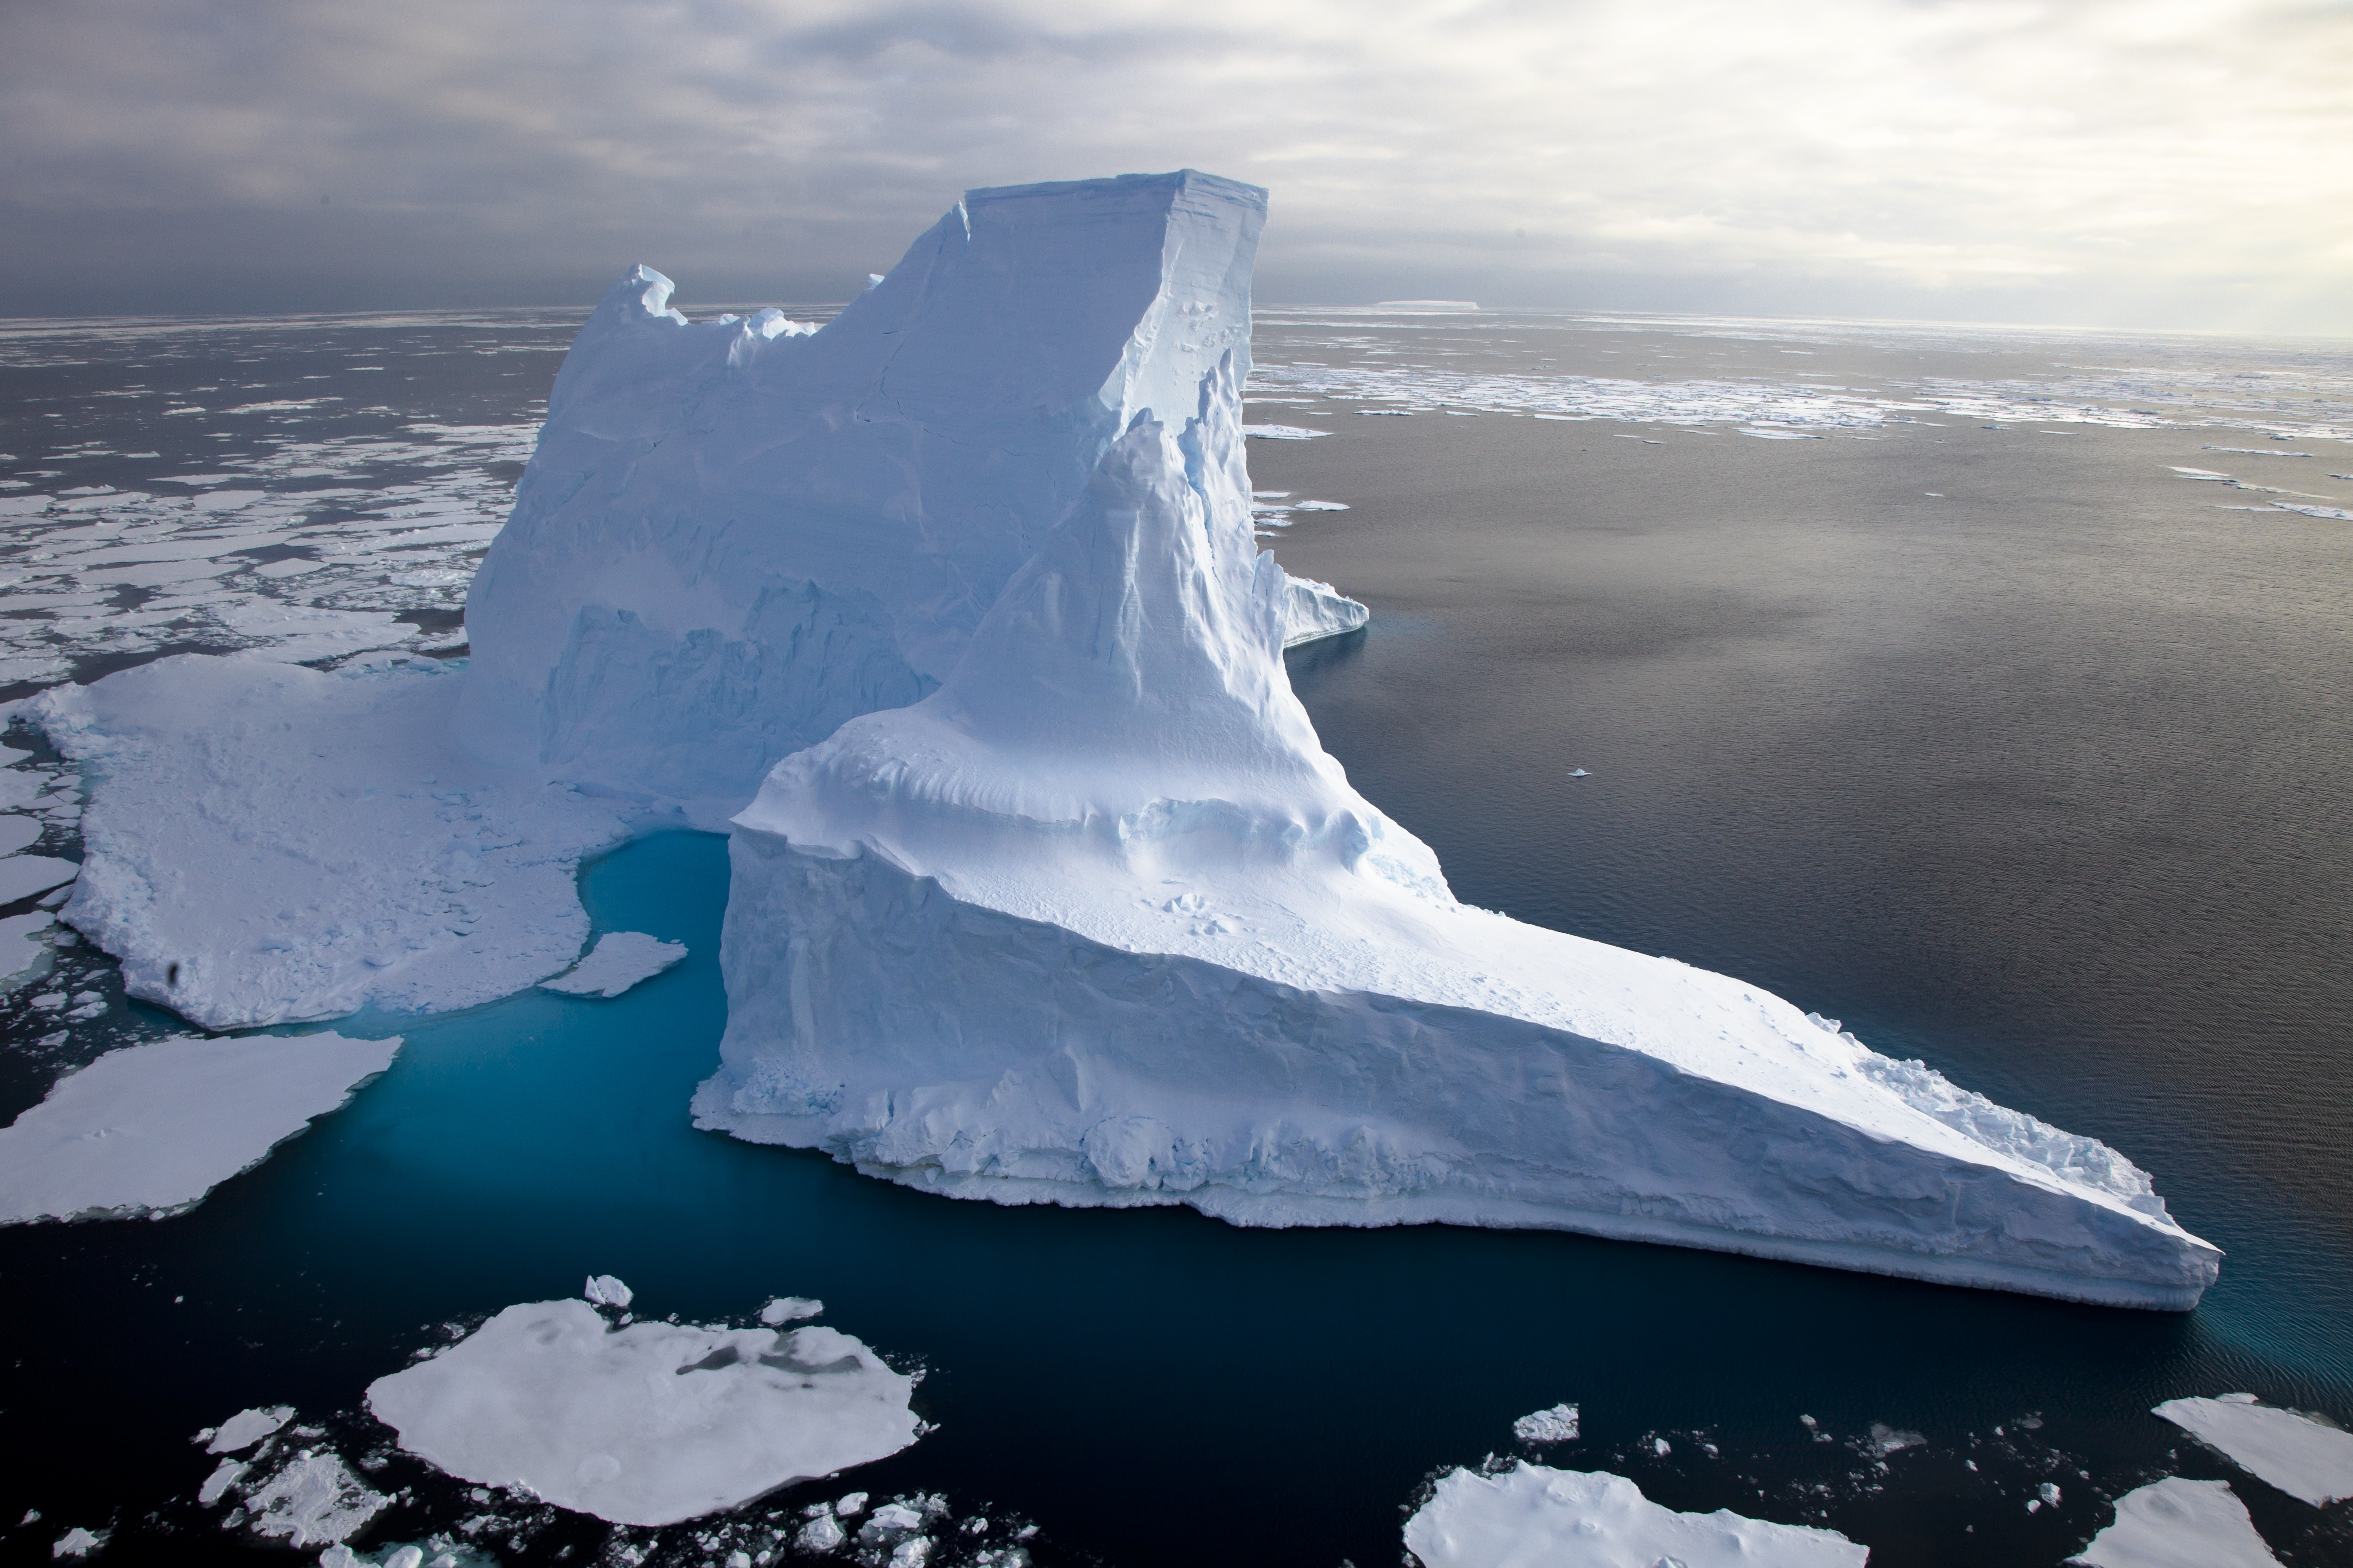 5410x3606 > Iceberg Wallpapers